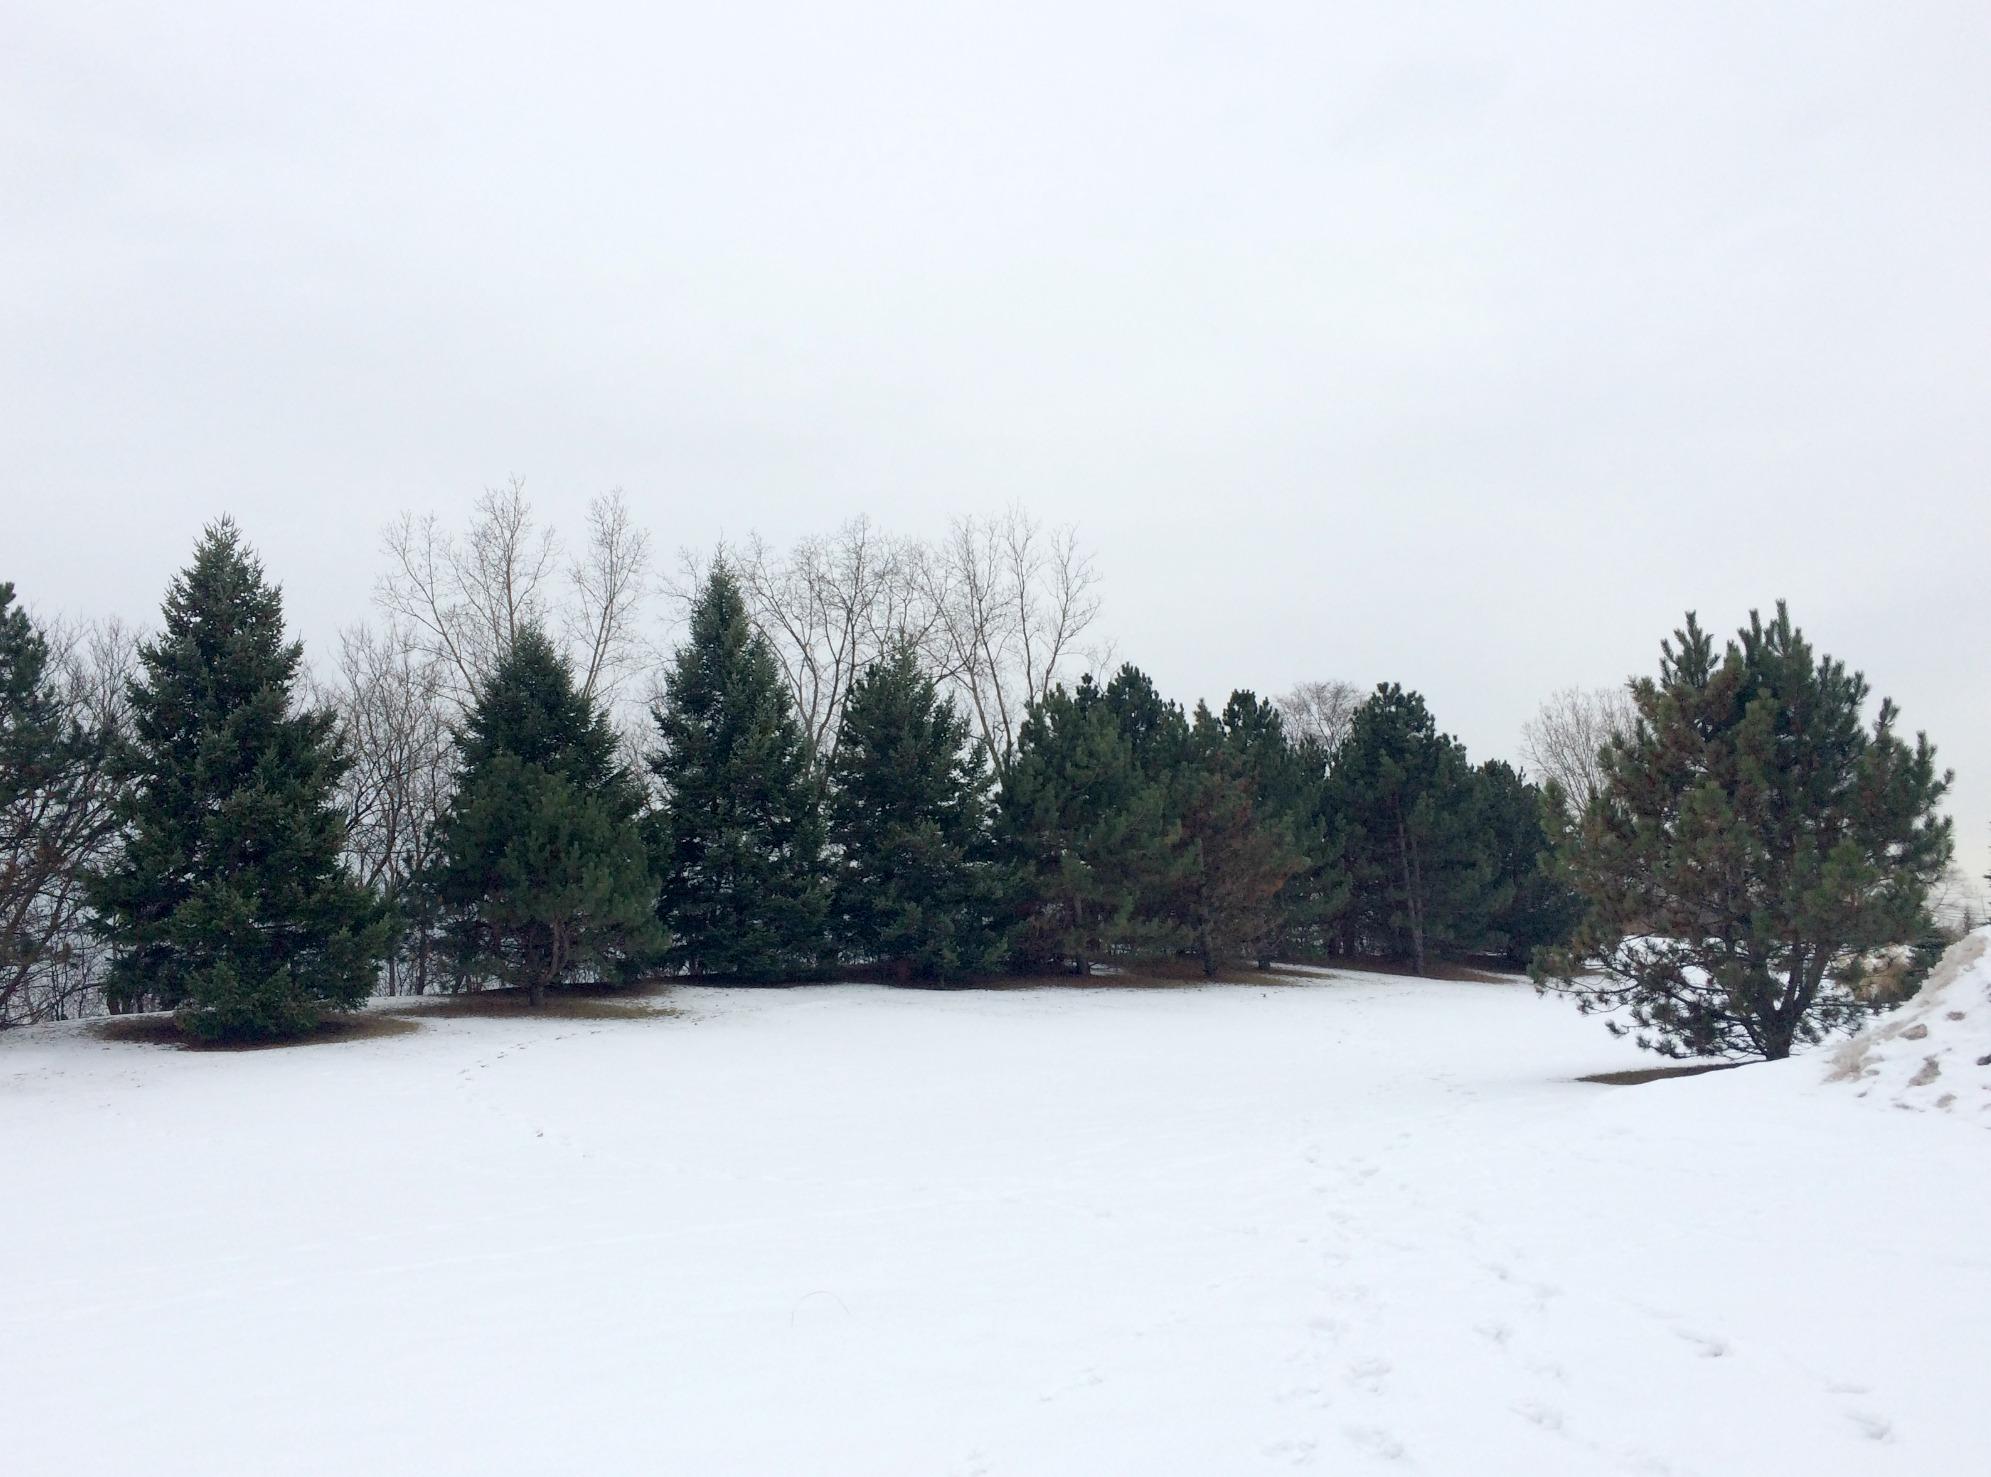 winter trees in michigan